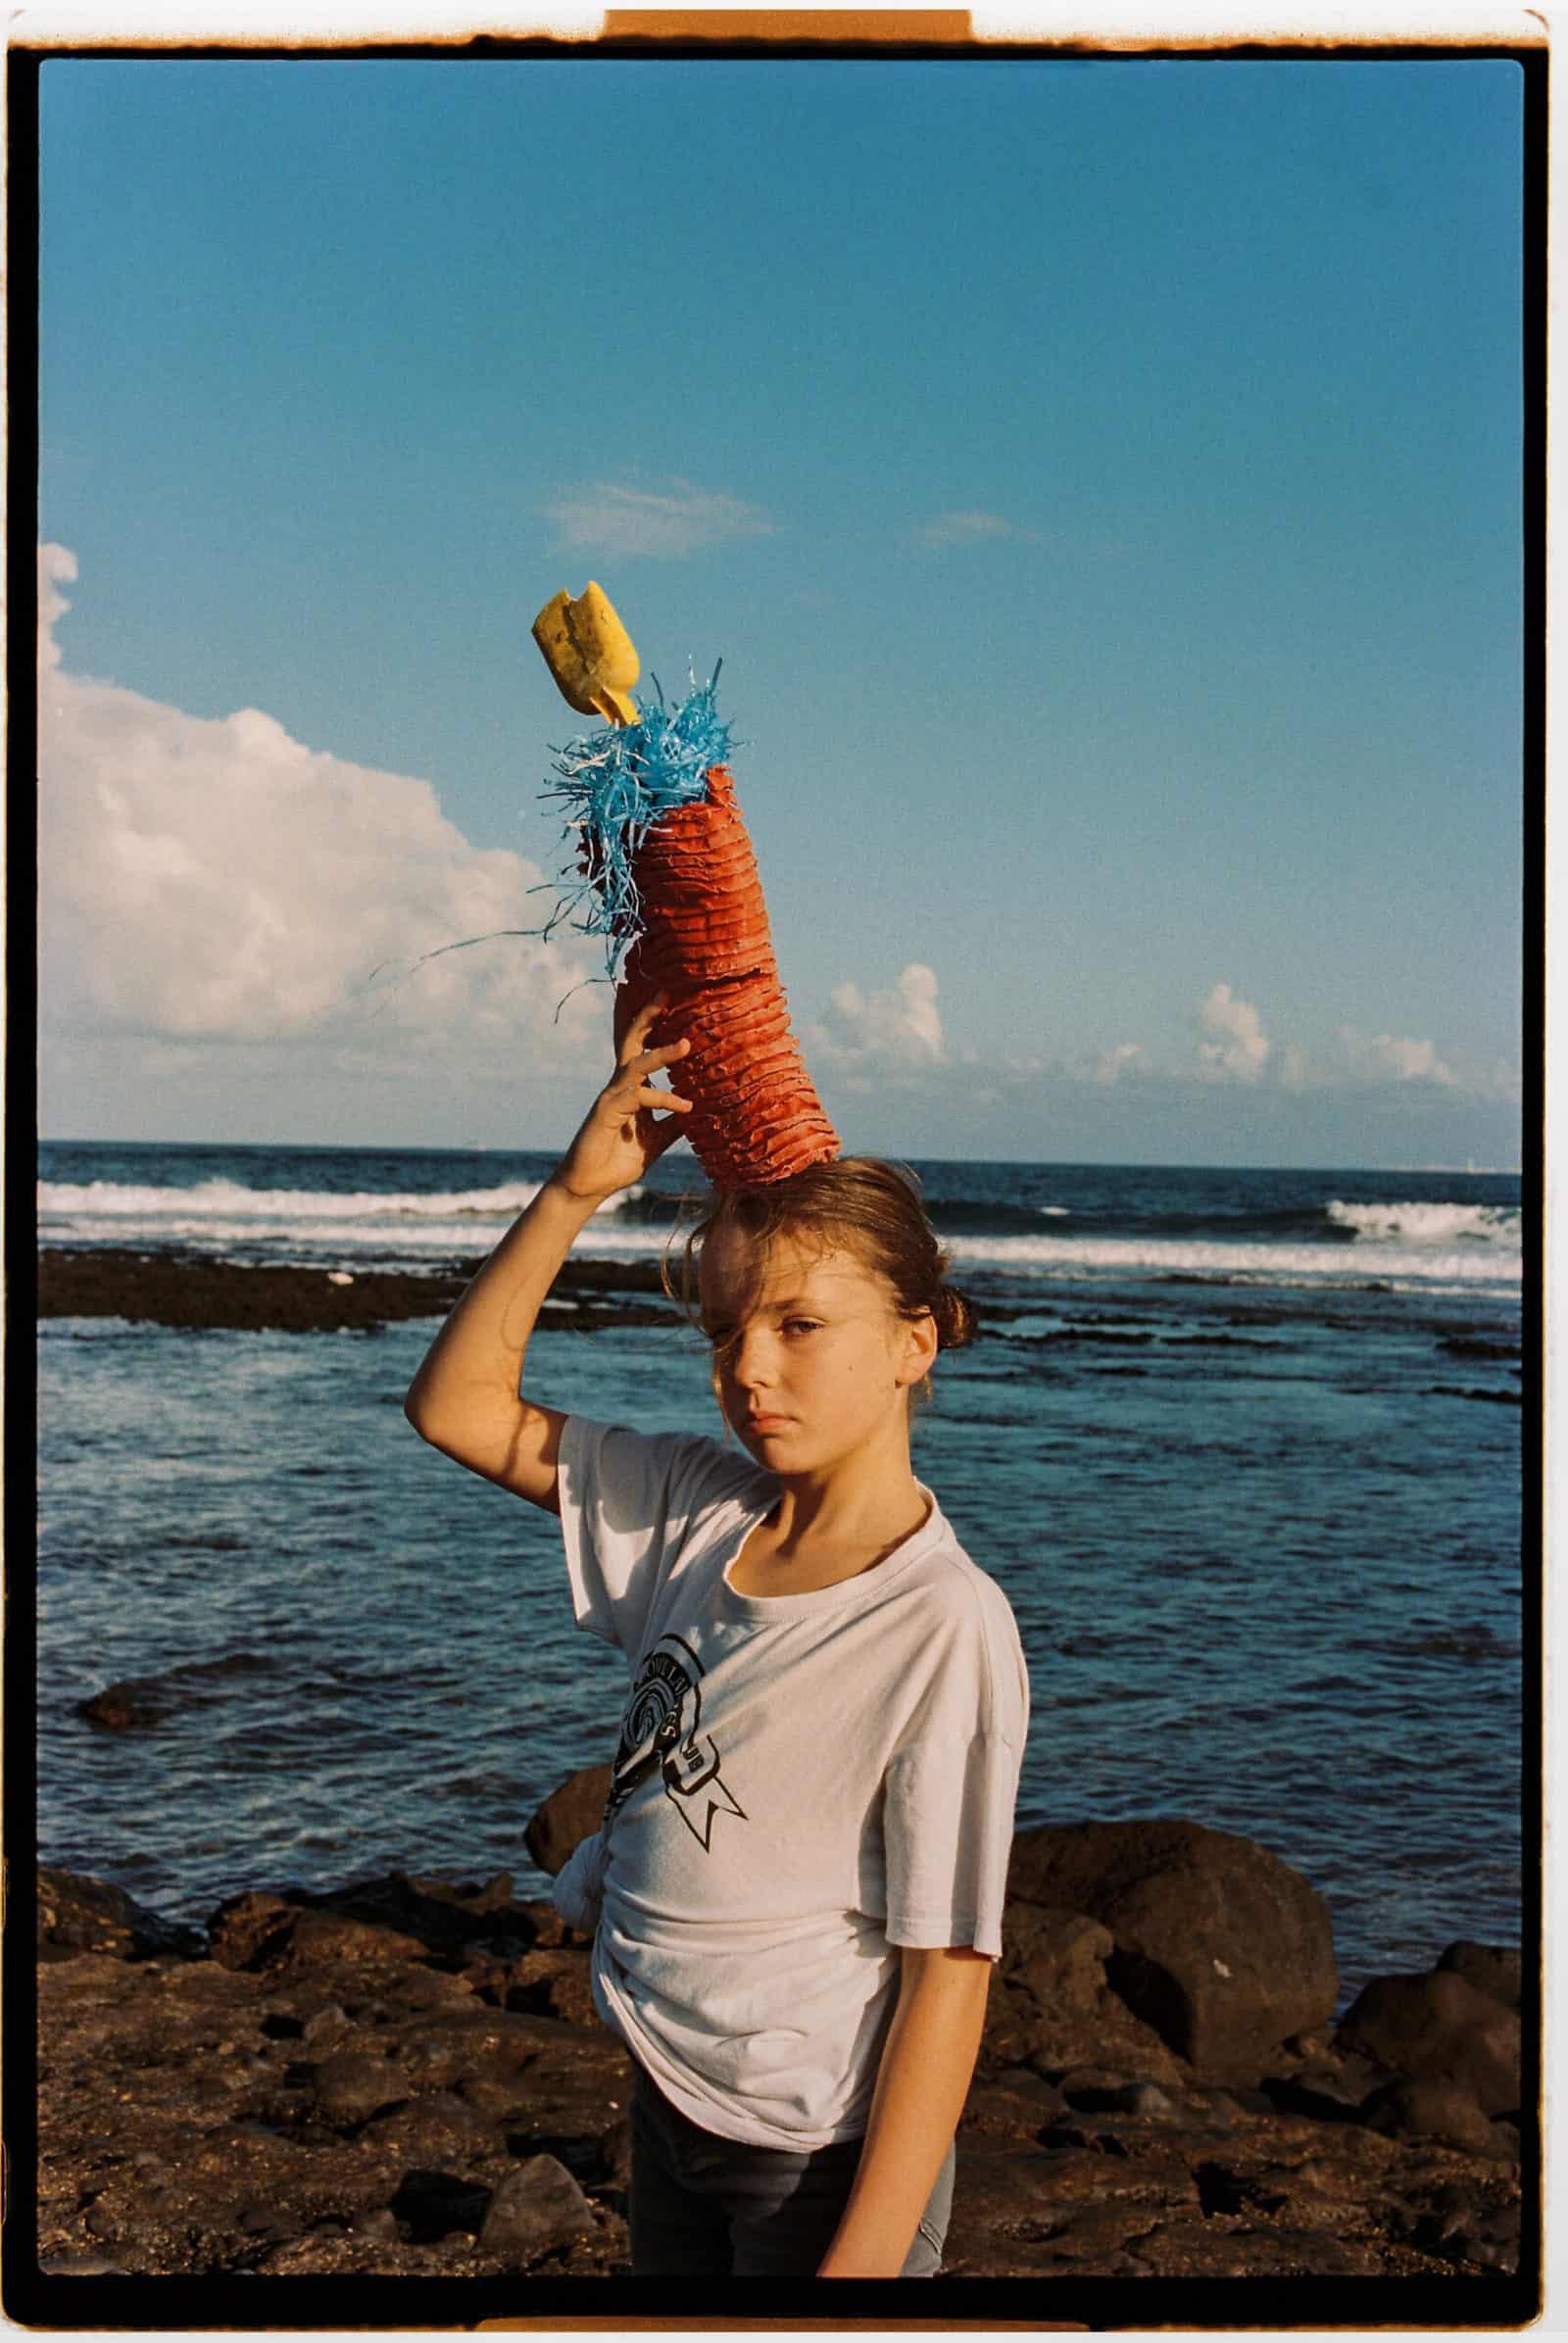 Catalin's World - Kodak Portrait 35mm